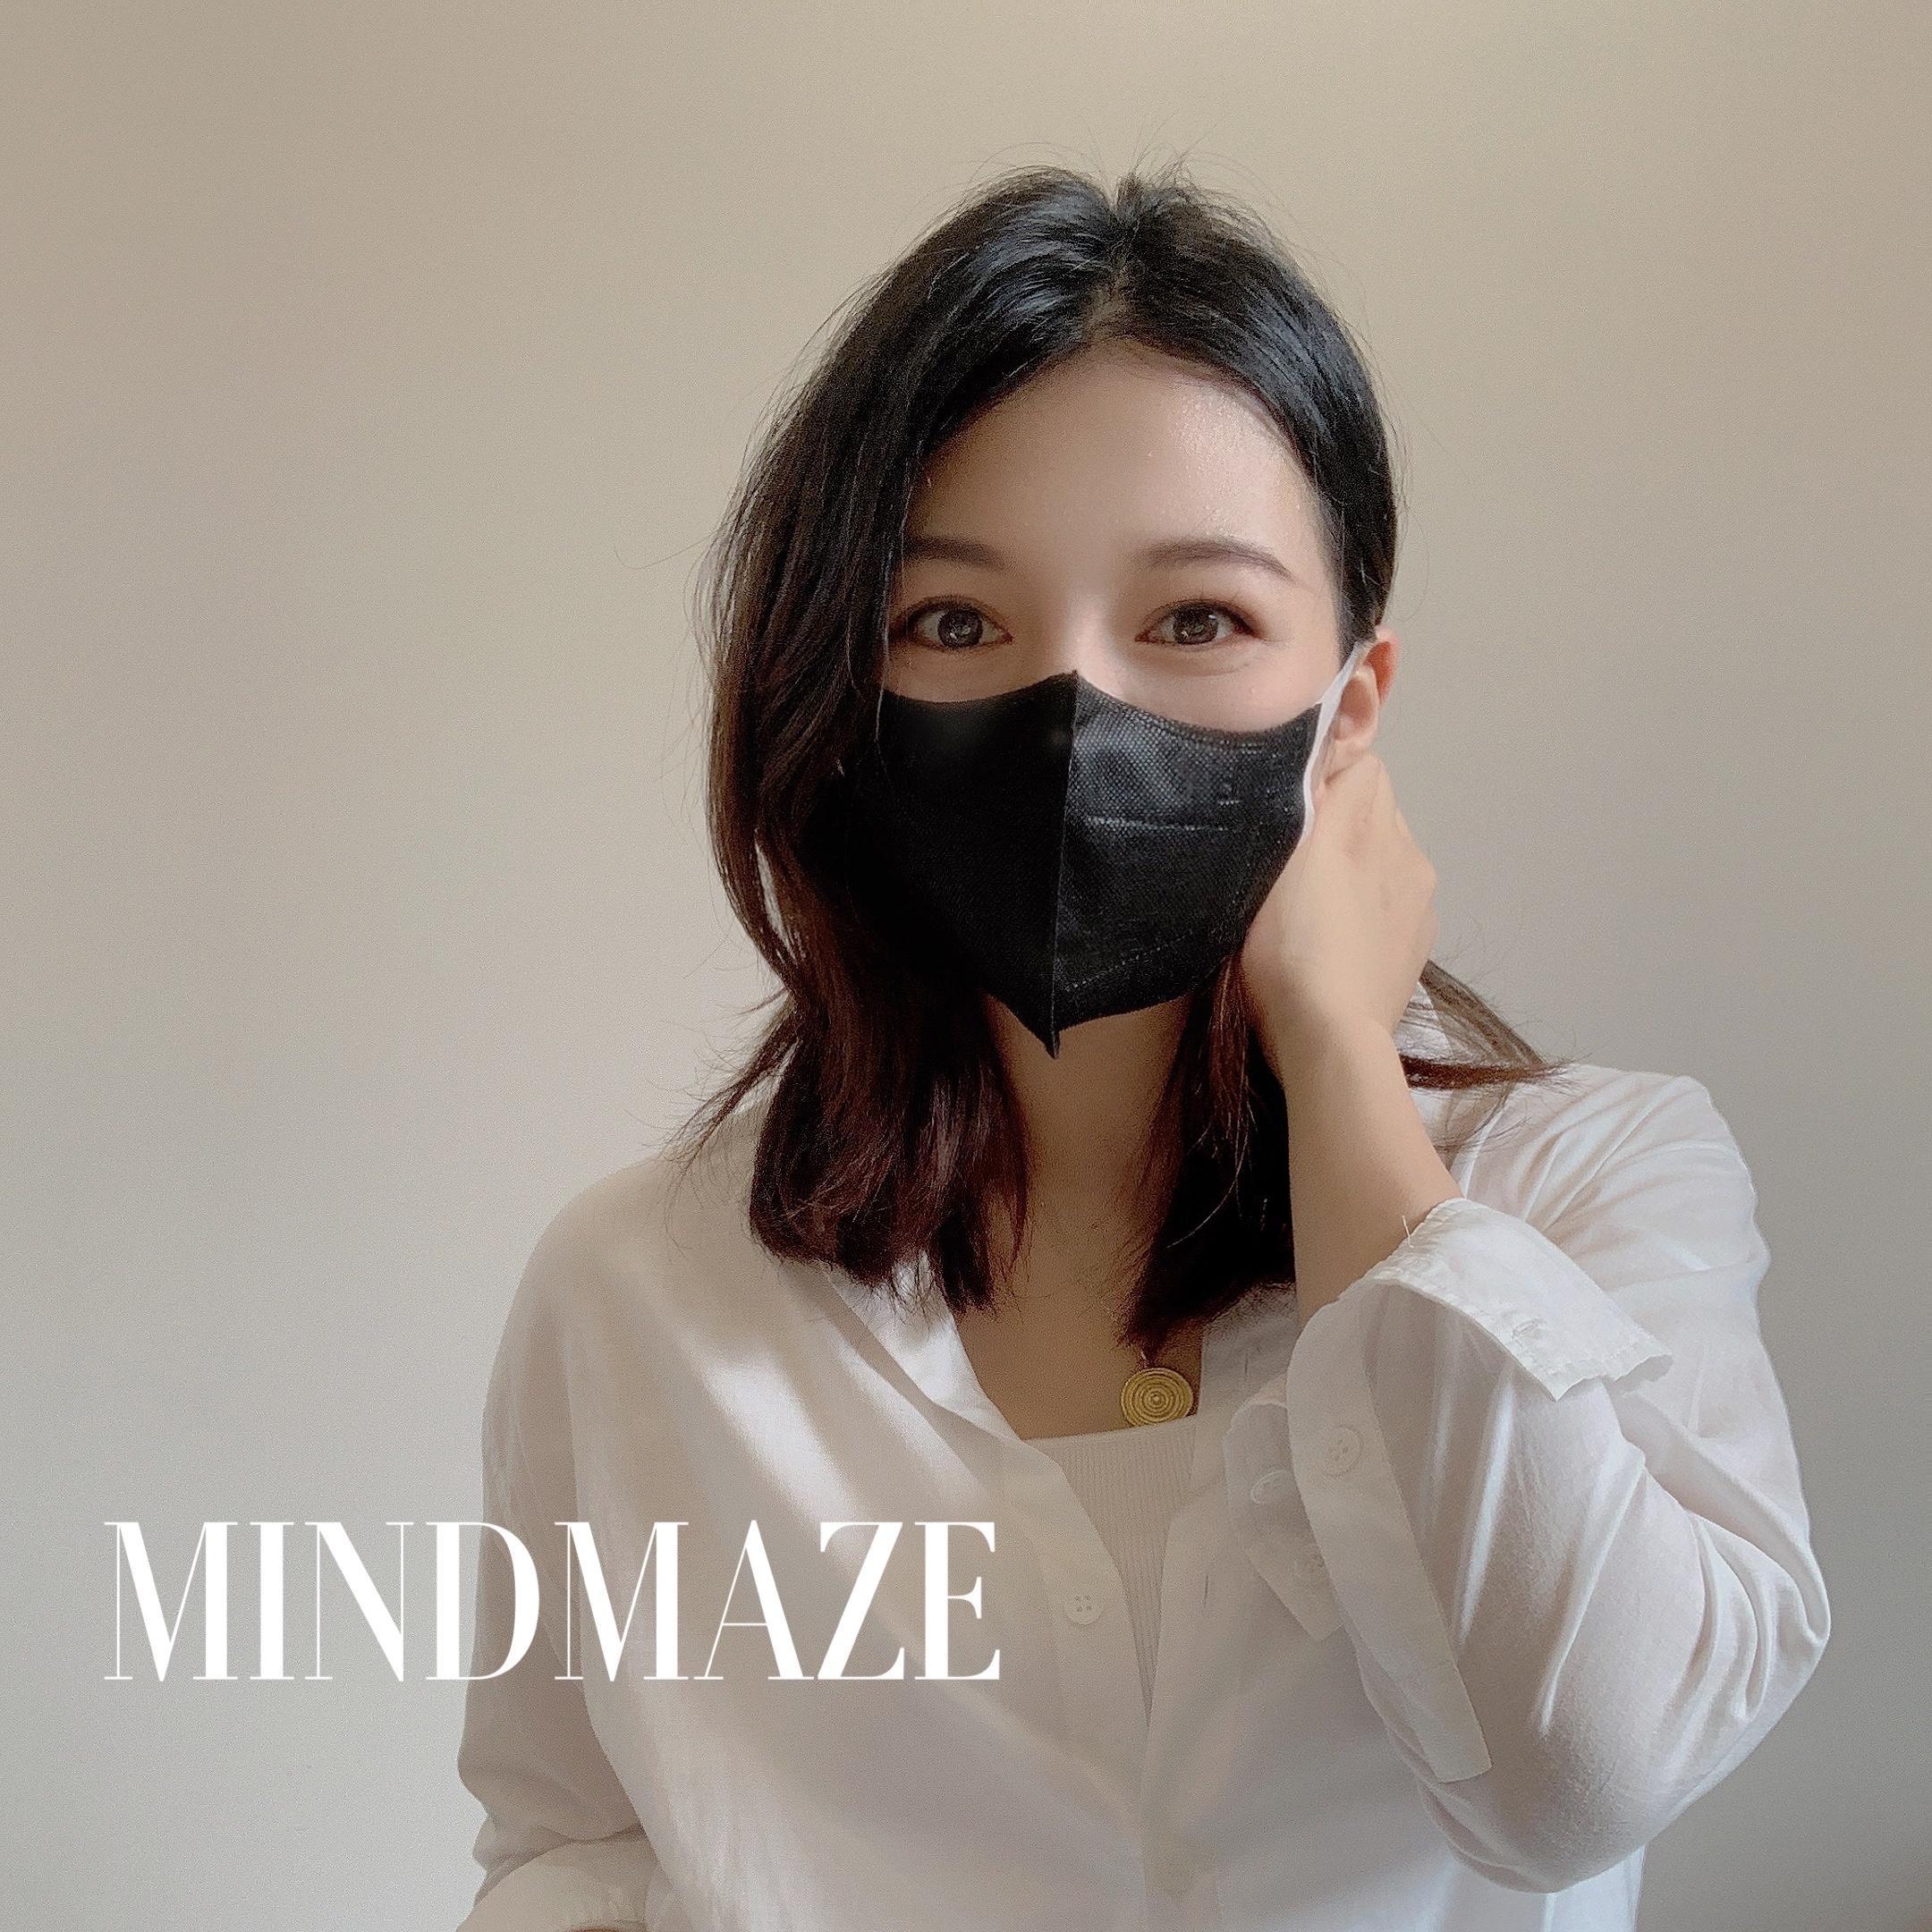 New Breathe smoothly 3d design face mask Light mask(图2)